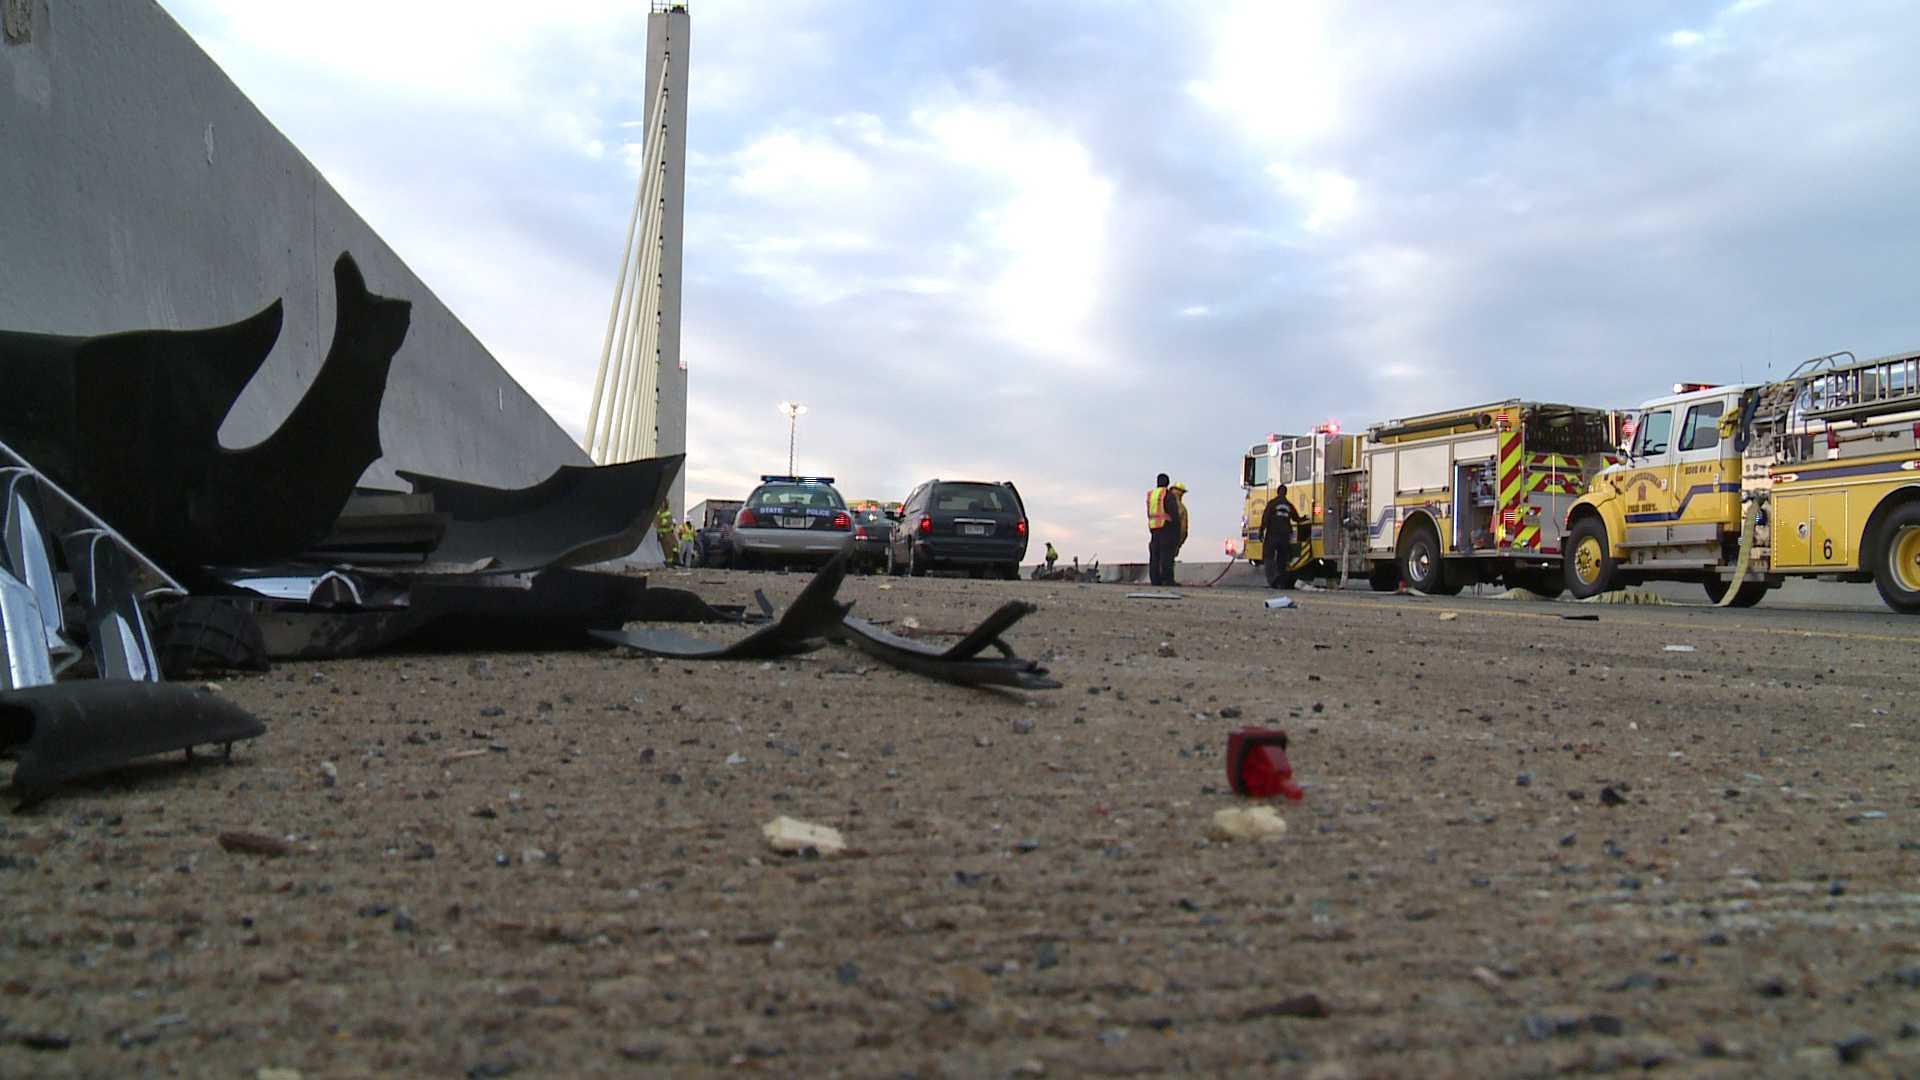 Photos: 1 dead after semi hauling frozen turkeys hits car on Varina-EnonBridge